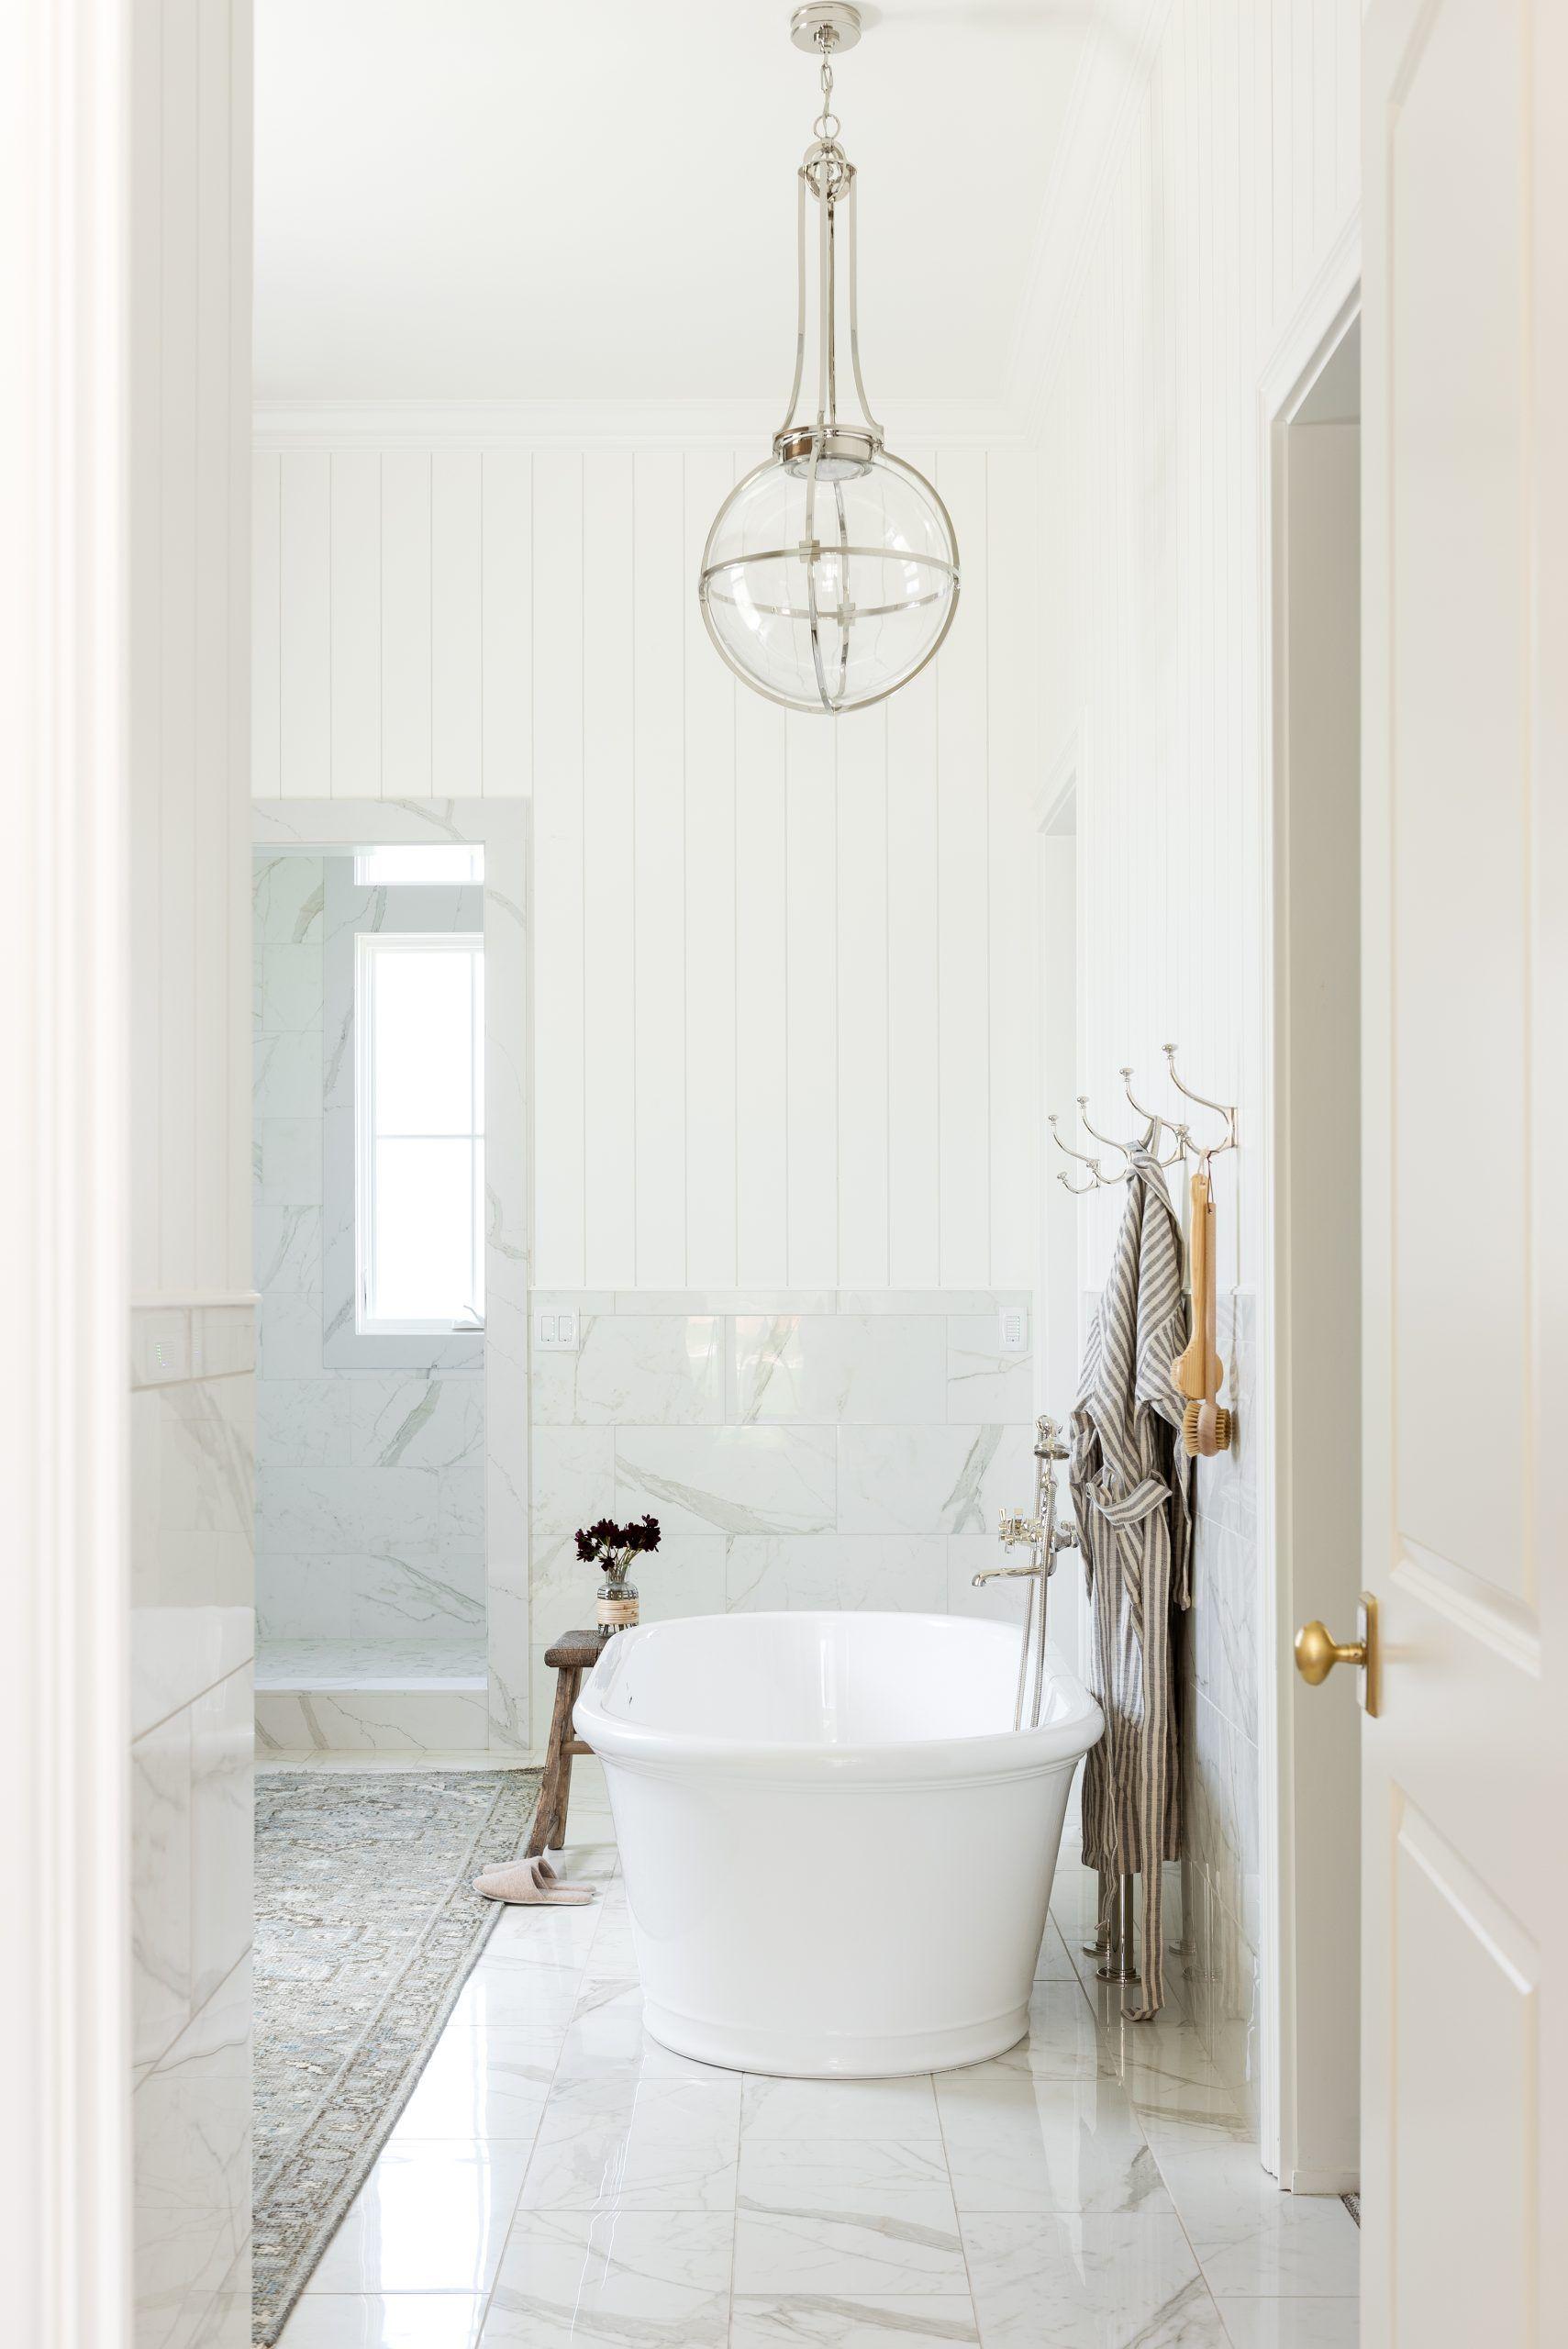 Home On The Ranch The Primary Bedroom Studio Mcgee In 2021 Master Bathroom Design Wainscoting Tiles Bedroom Studio